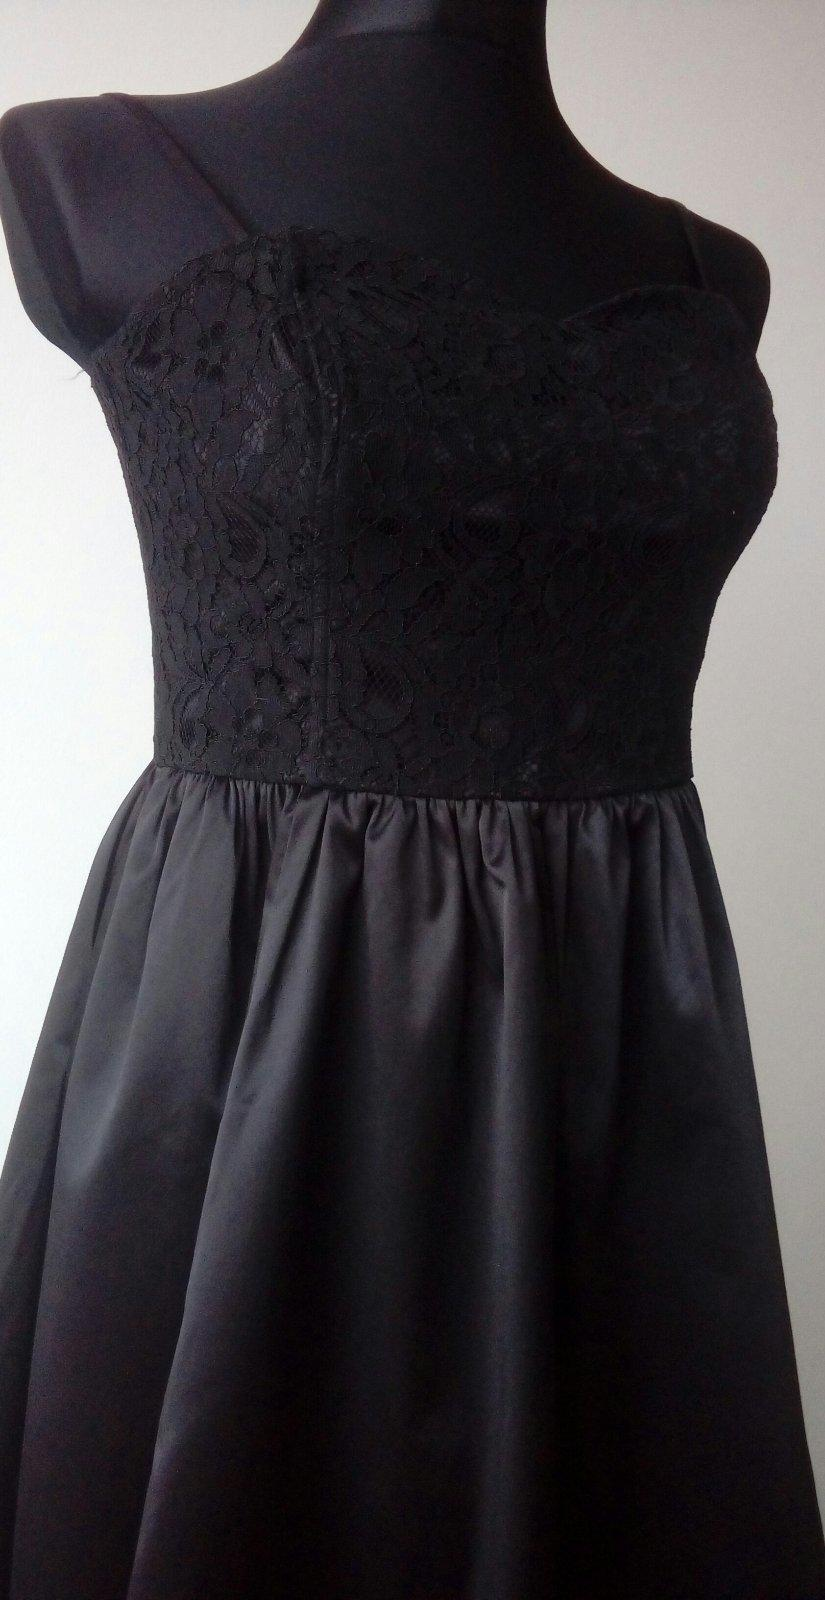 elegantné šaty H&M, m/l - Obrázok č. 1